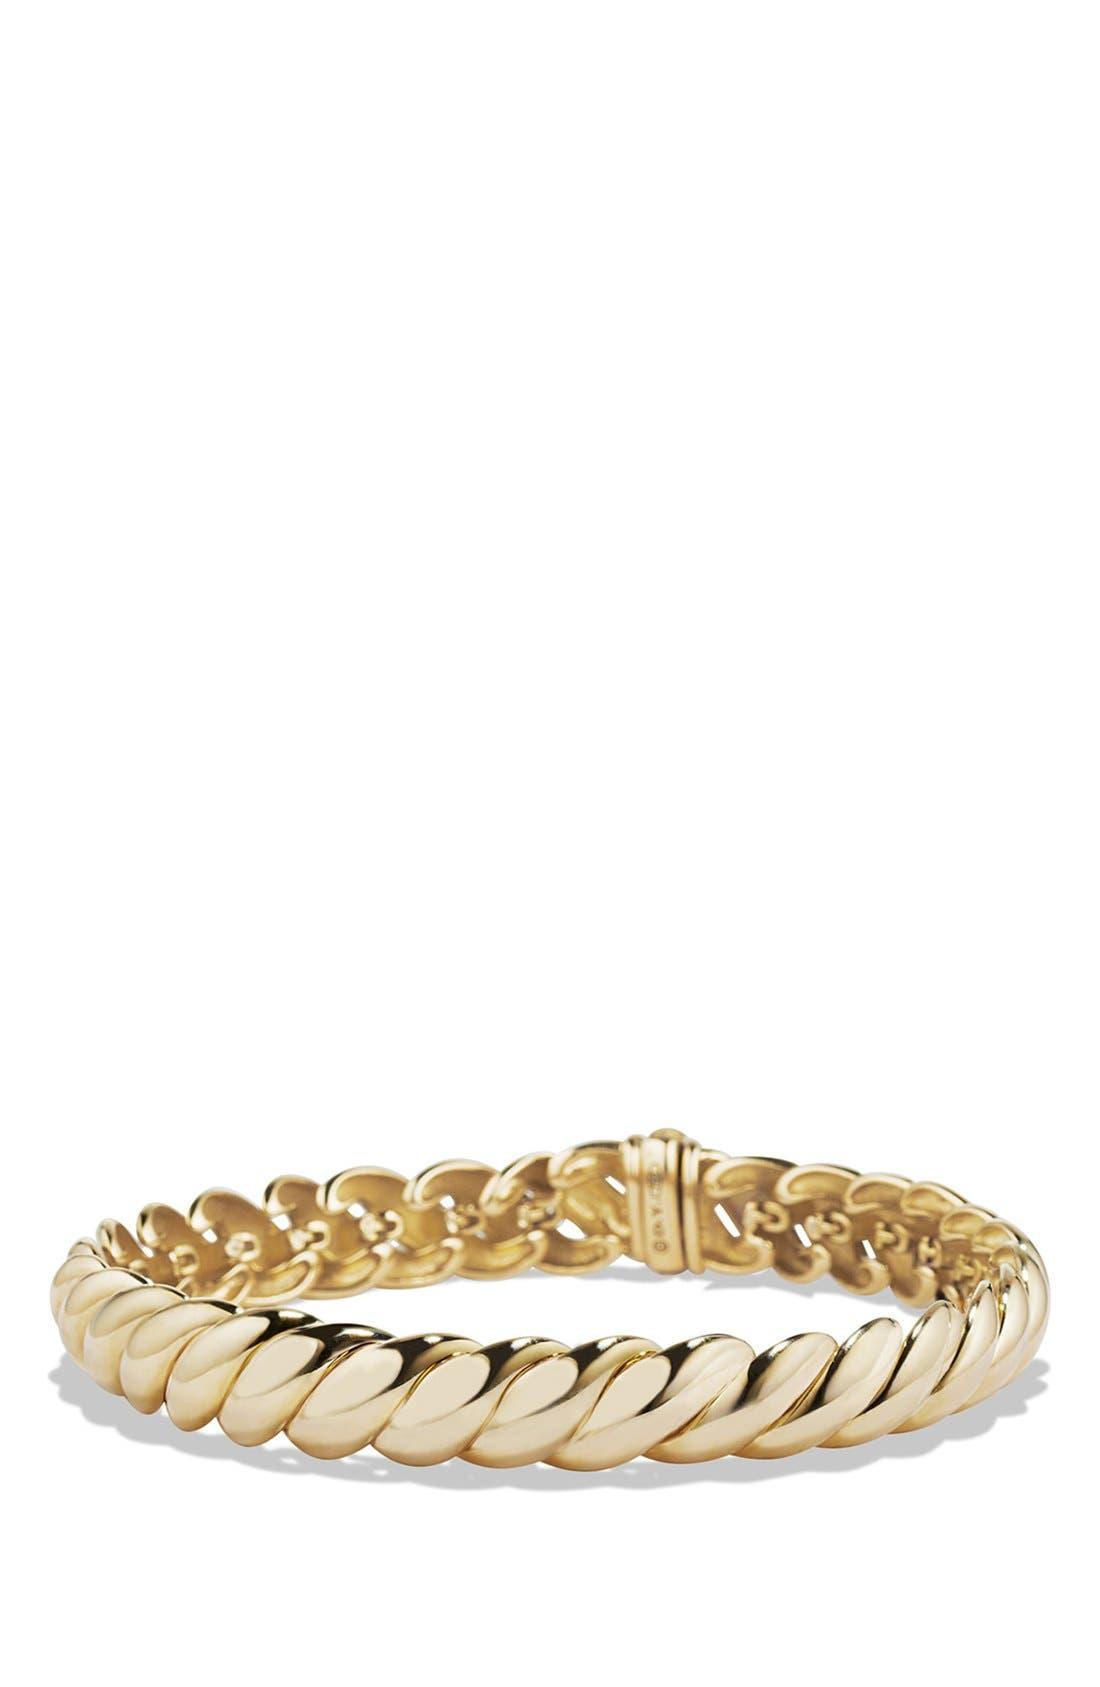 Alternate Image 1 Selected - David Yurman 'Hampton Cable' Link Bracelet in Gold